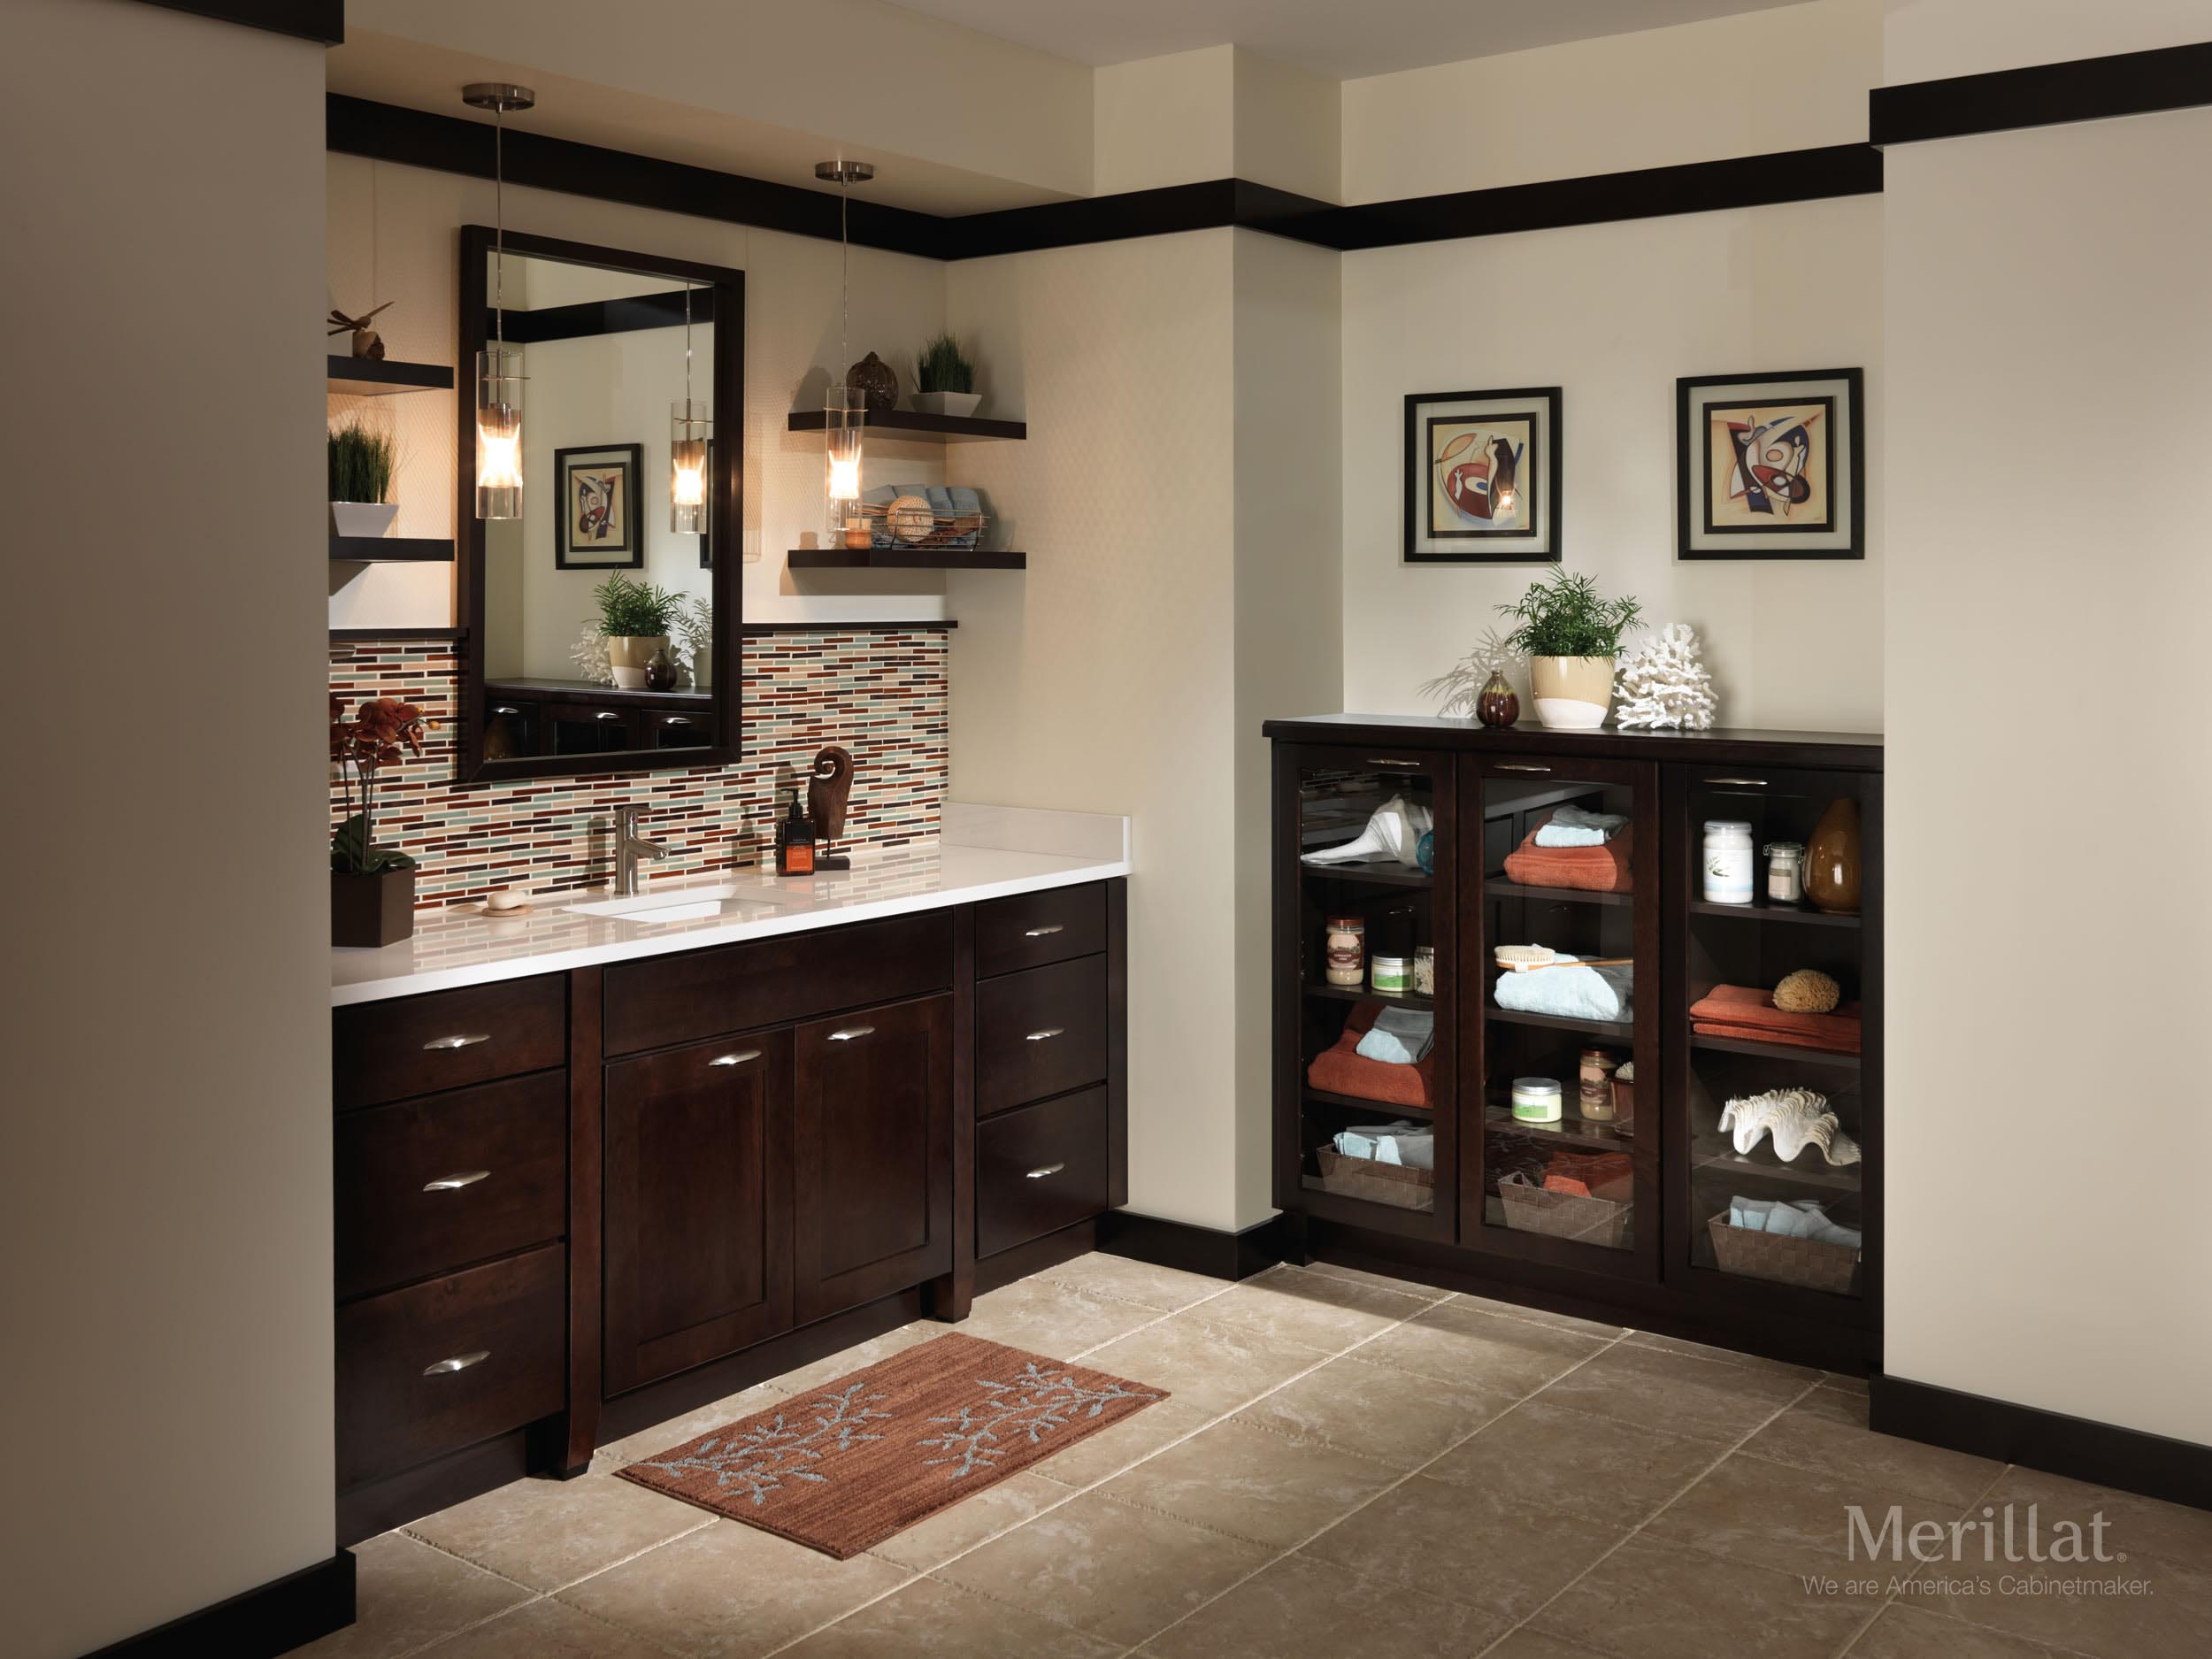 Merillat bathroom vanity - Merillat Bathroom Vanity 18